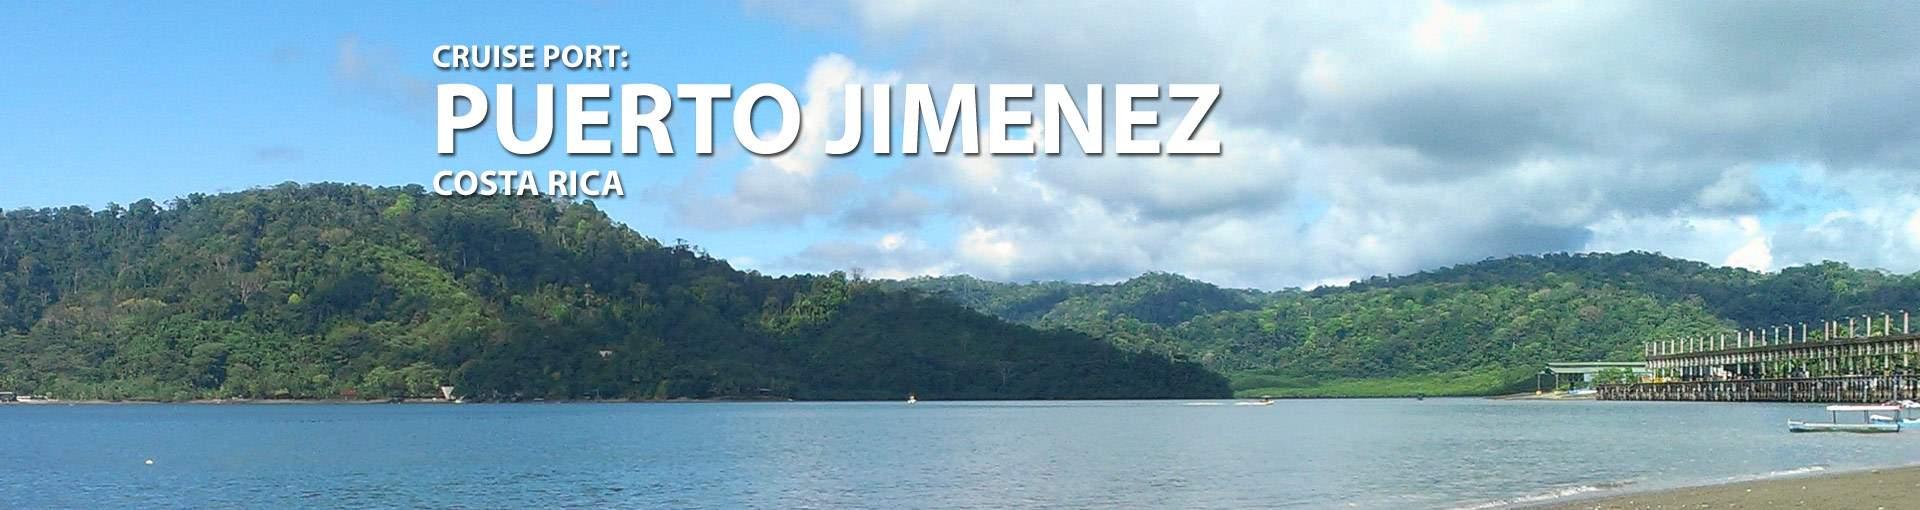 Puerto Jimenez, Costa Rica Cruise Port